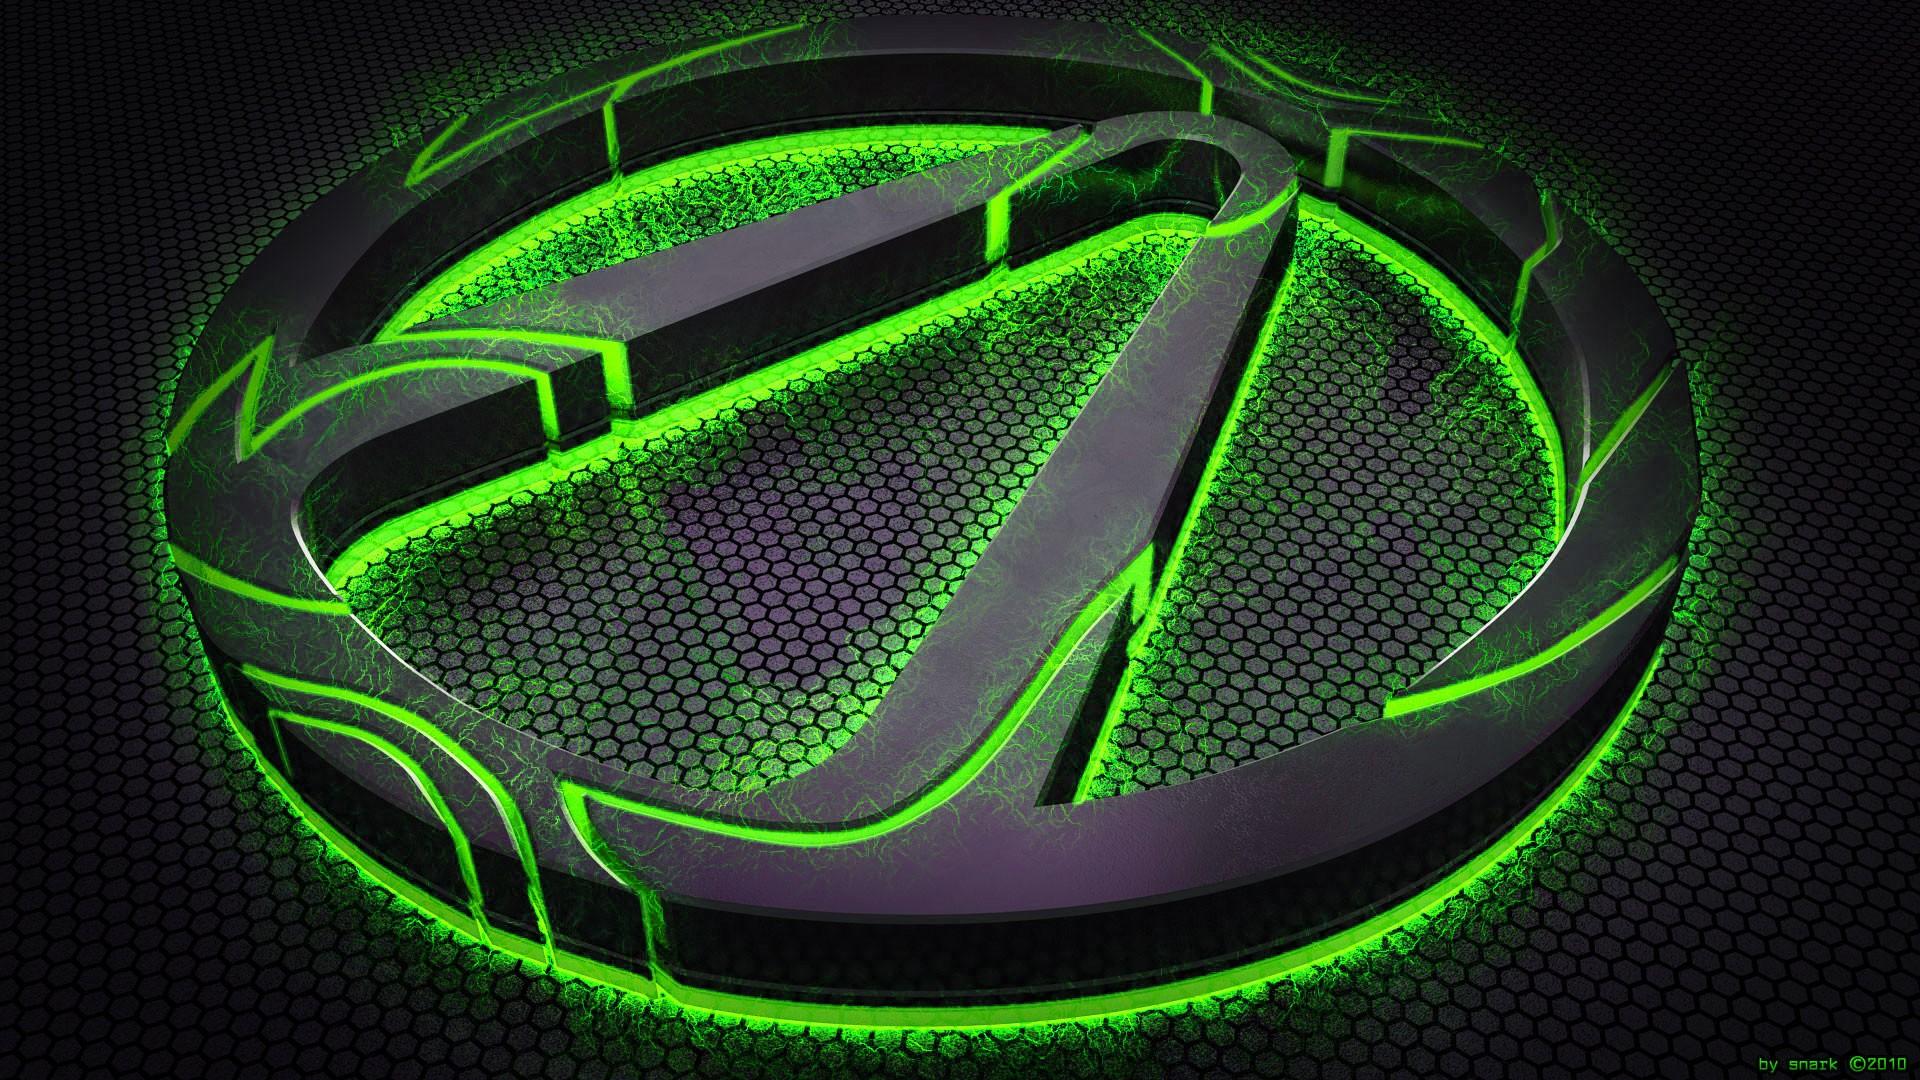 wallpaper : illustration, neon, green, circle, ball, borderlands